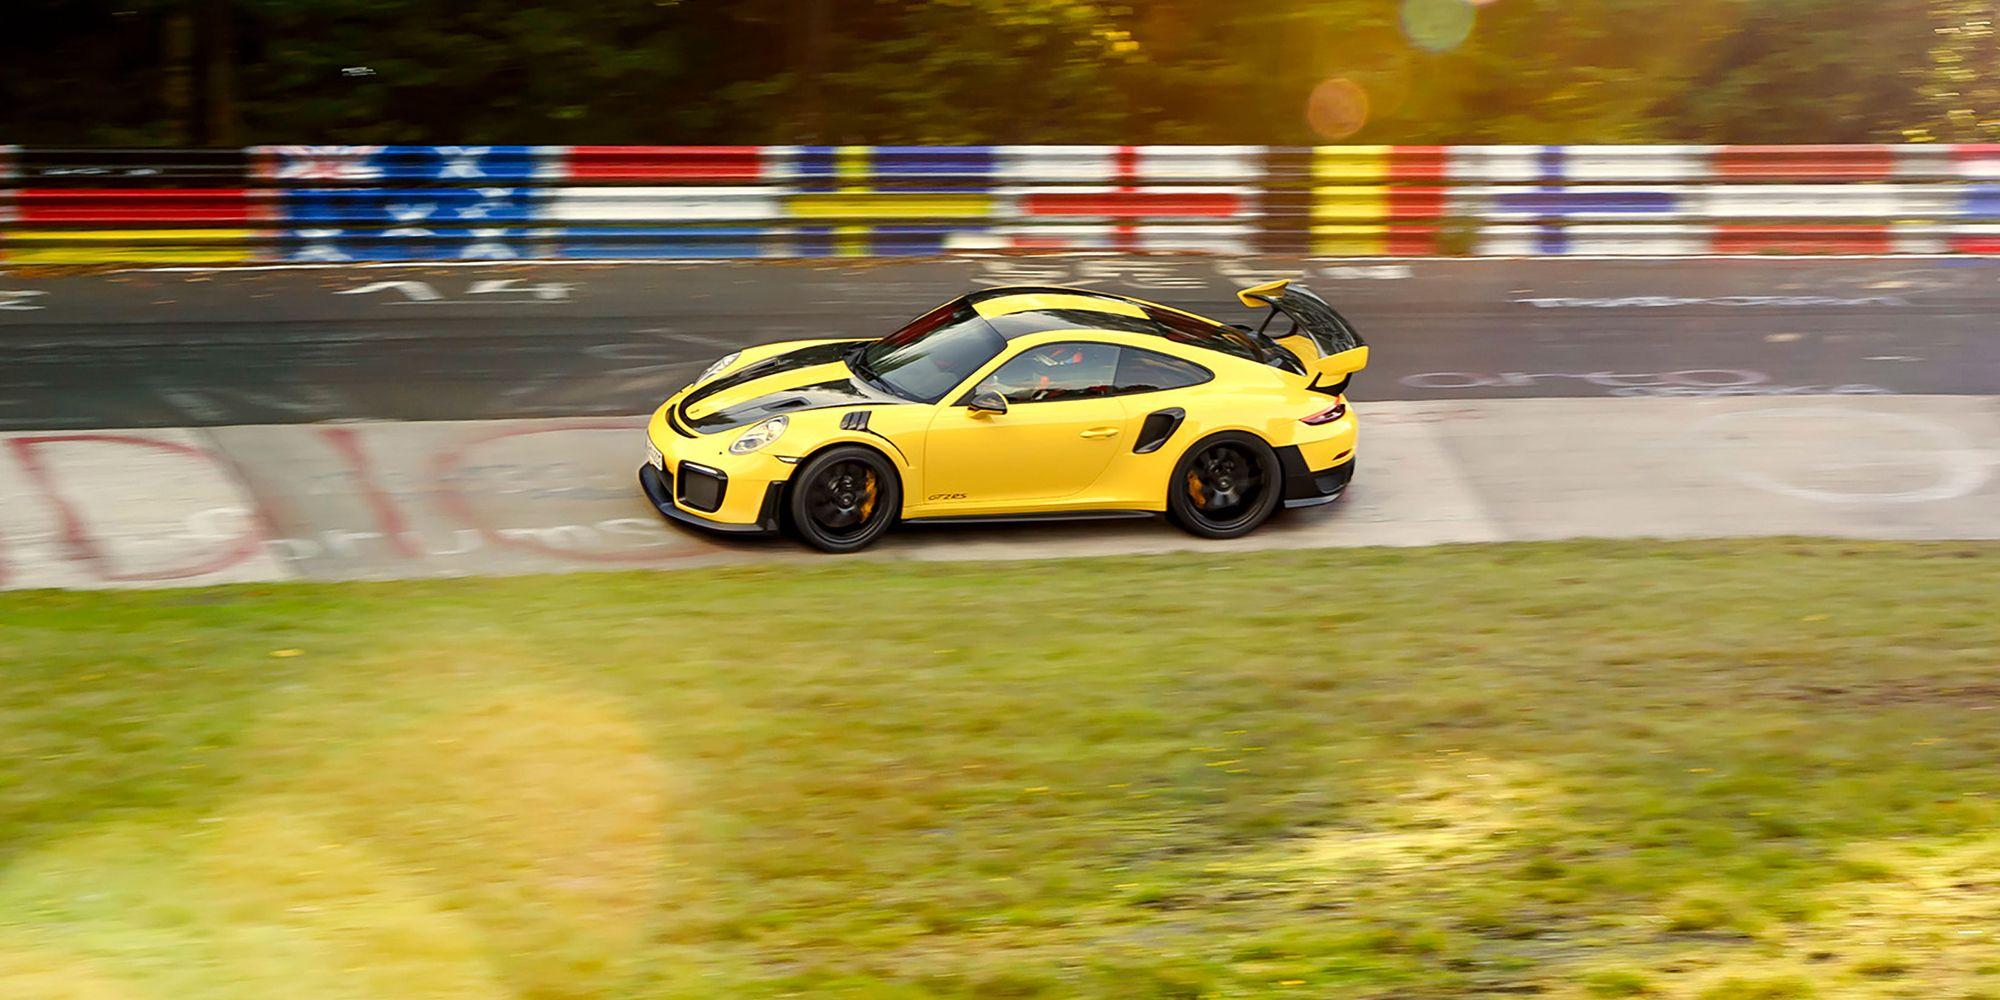 high-911-gt2-rs-world-record-nu-rburgring-2017-porsche-ag-1506520059 Stunning Porsche 911 Gt2 Rs Vs Lamborghini Aventador Cars Trend